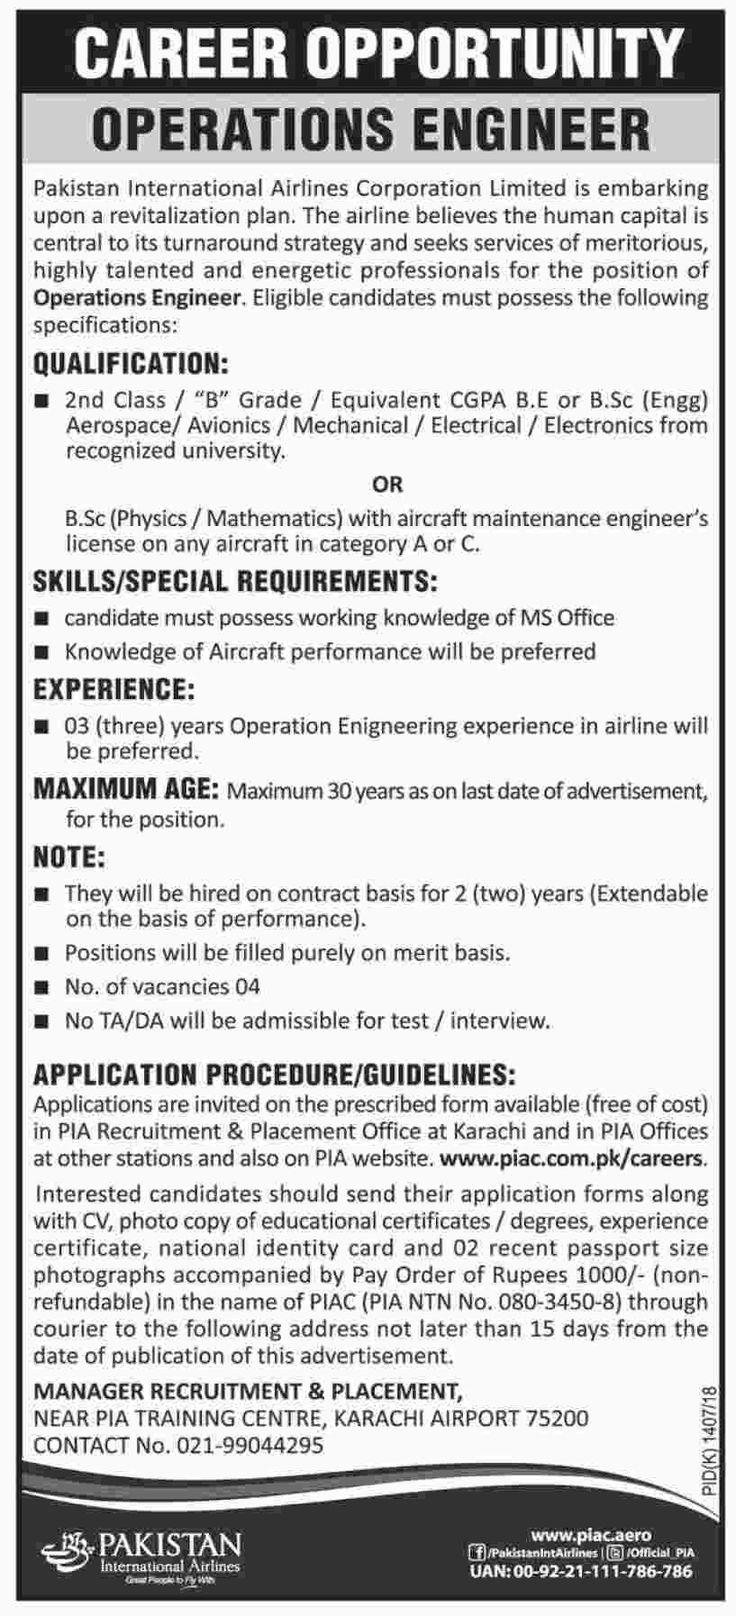 Pakistan International Airlines Jobs 2017 In Karachi For Operations Engineer http://www.jobsfanda.com/pakistan-international-airlines-jobs-2017-for-operations-engineer/